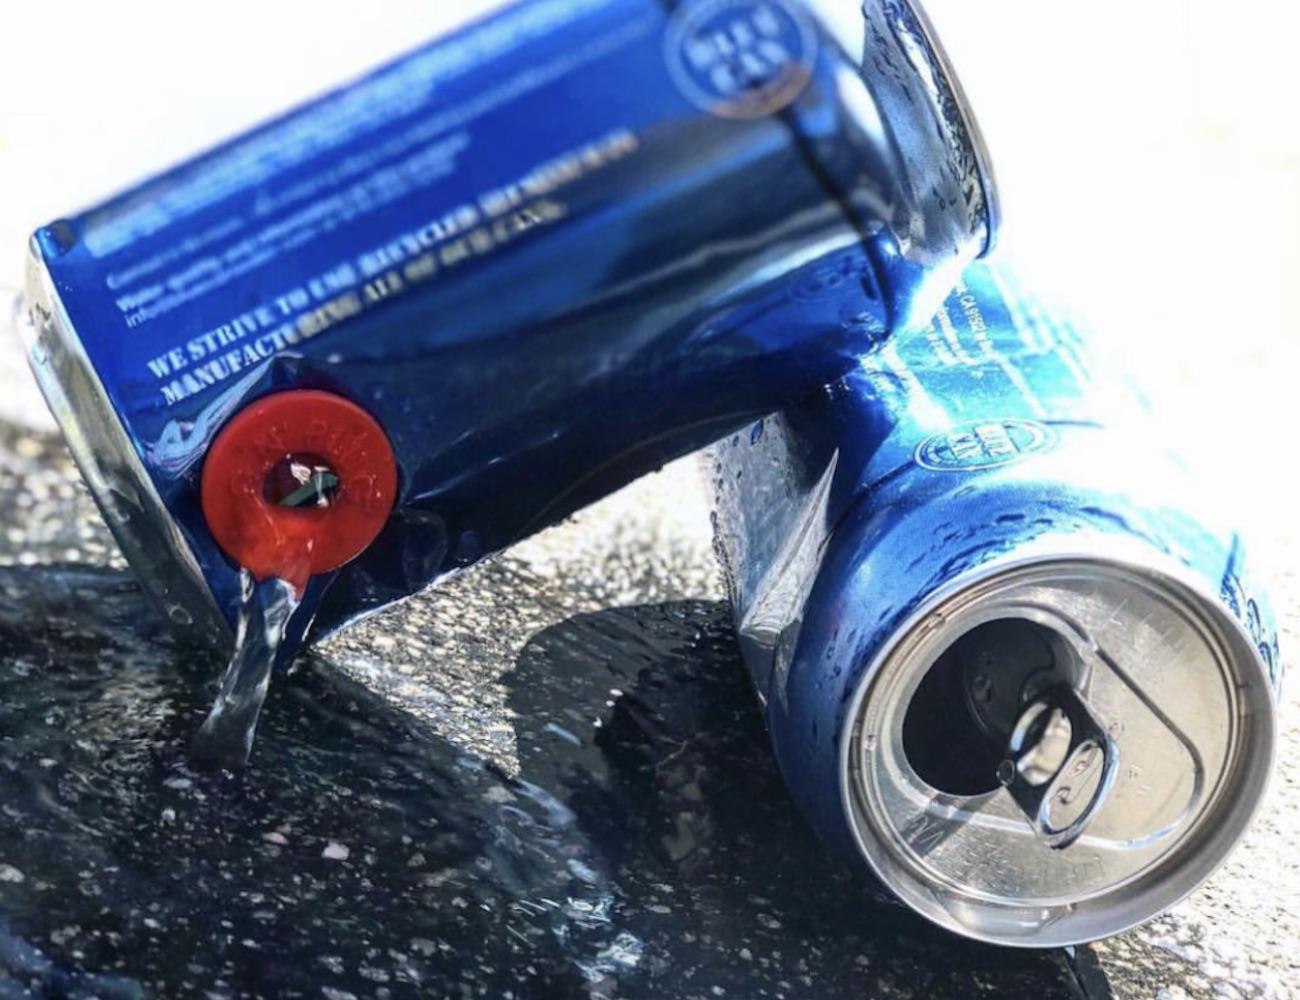 Chug n' Plug Beer Chugging Keychain